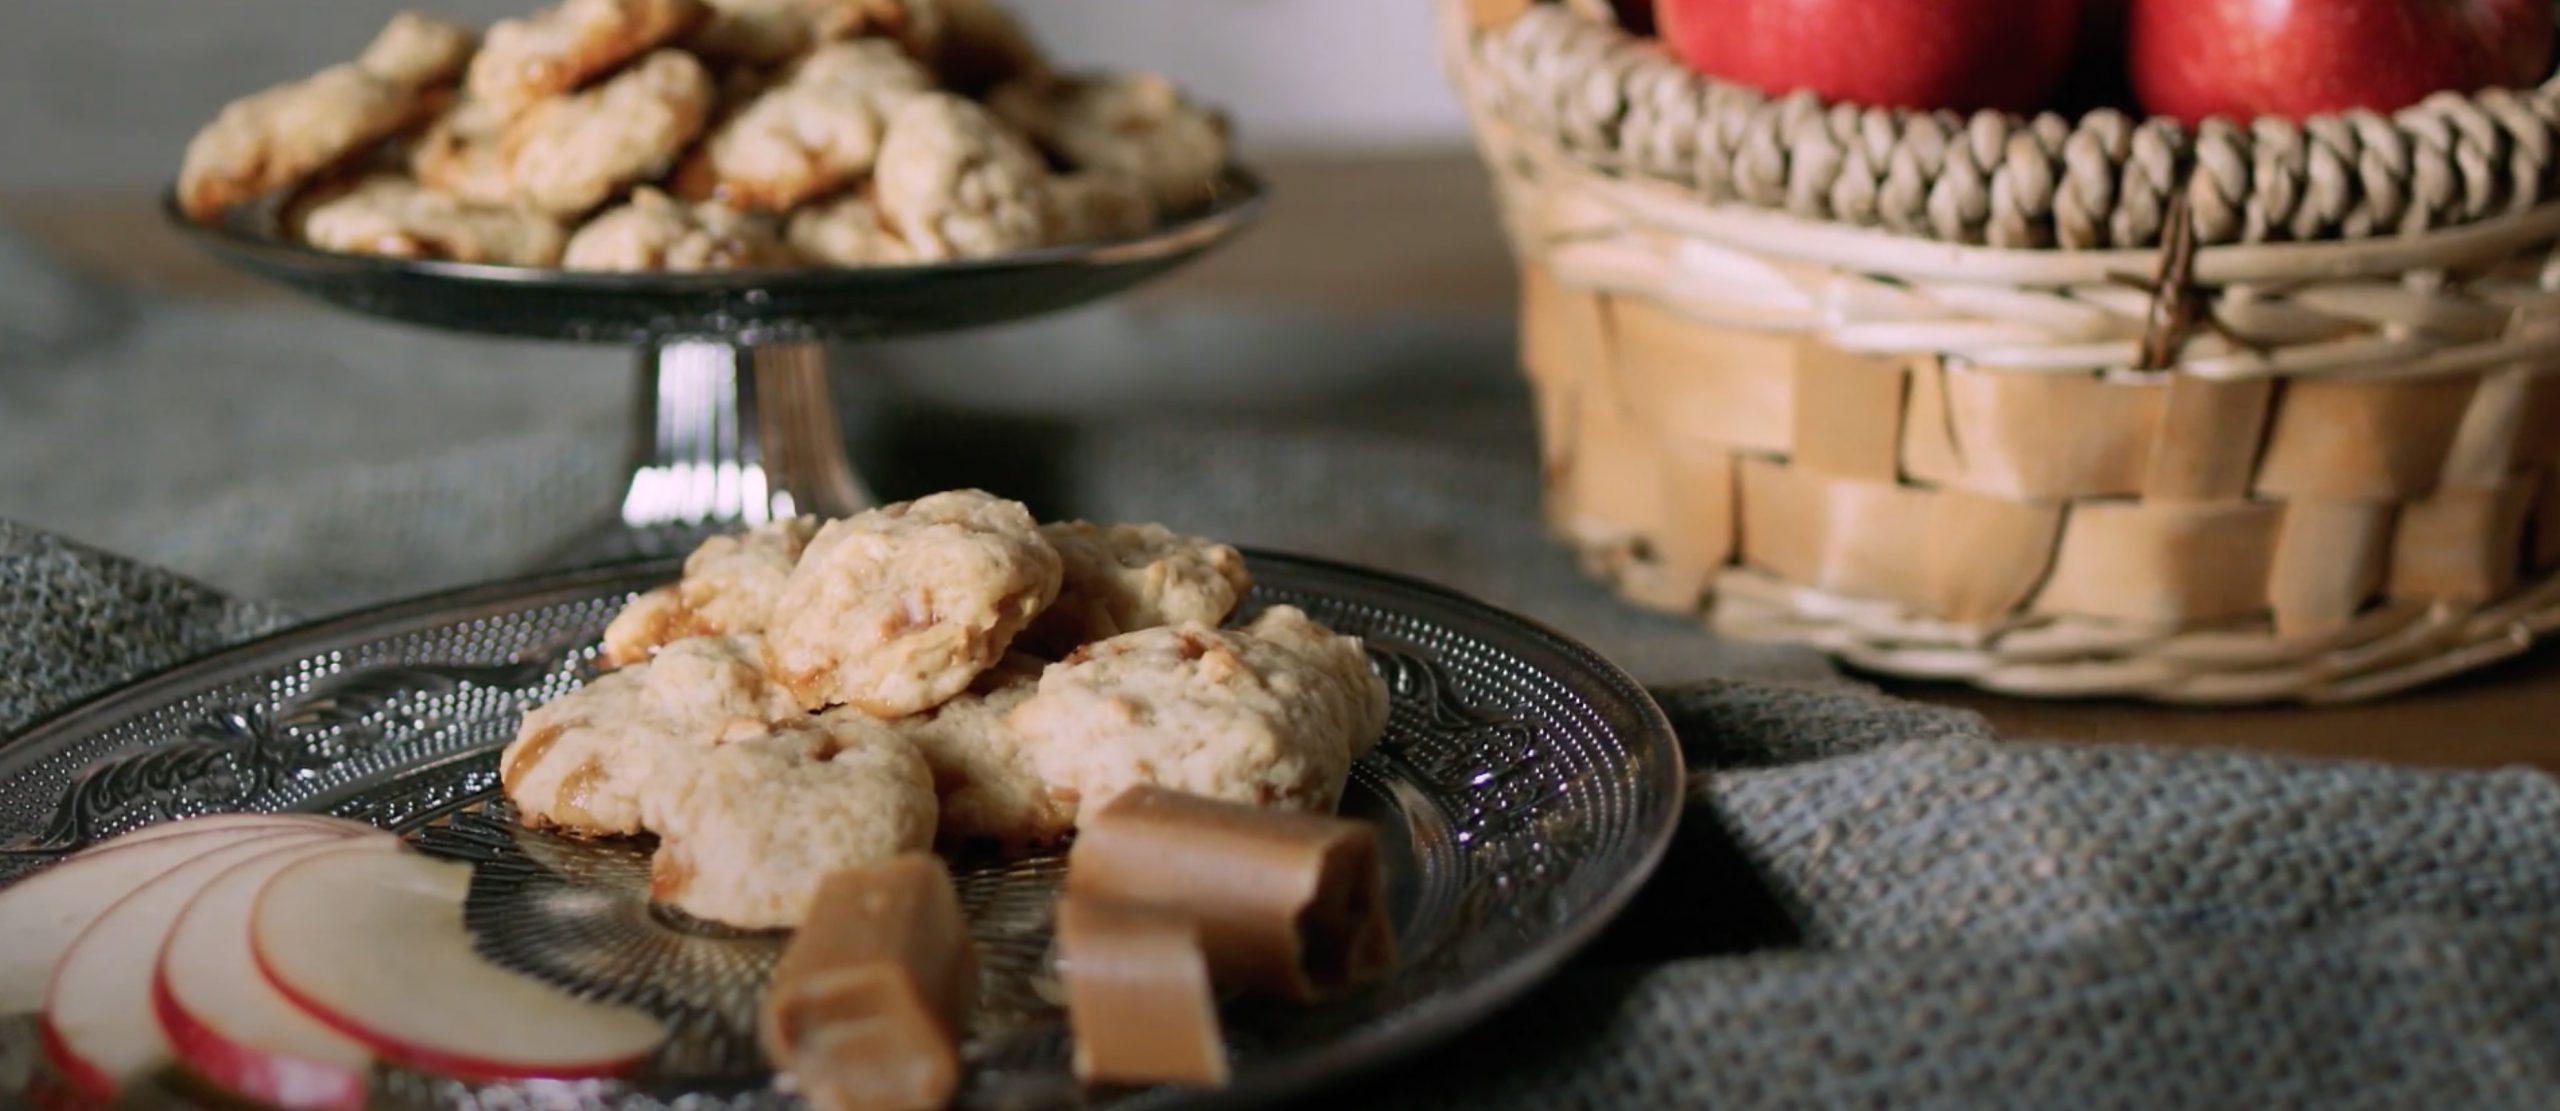 Apfel-Toffee-Kekse - himmlisch saftig und knusprig!